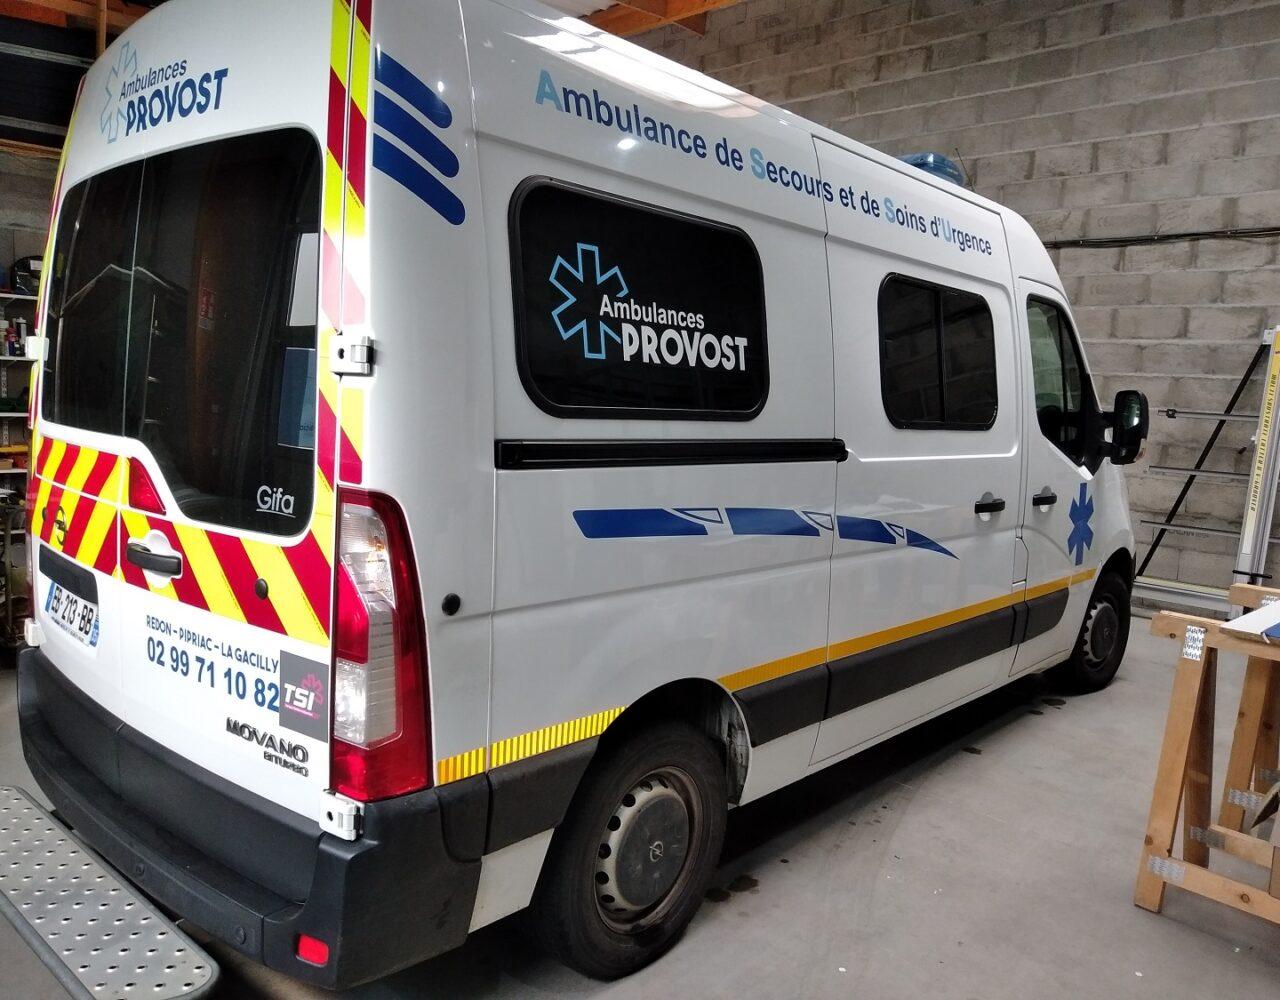 stickage de véhicule ambulance redon